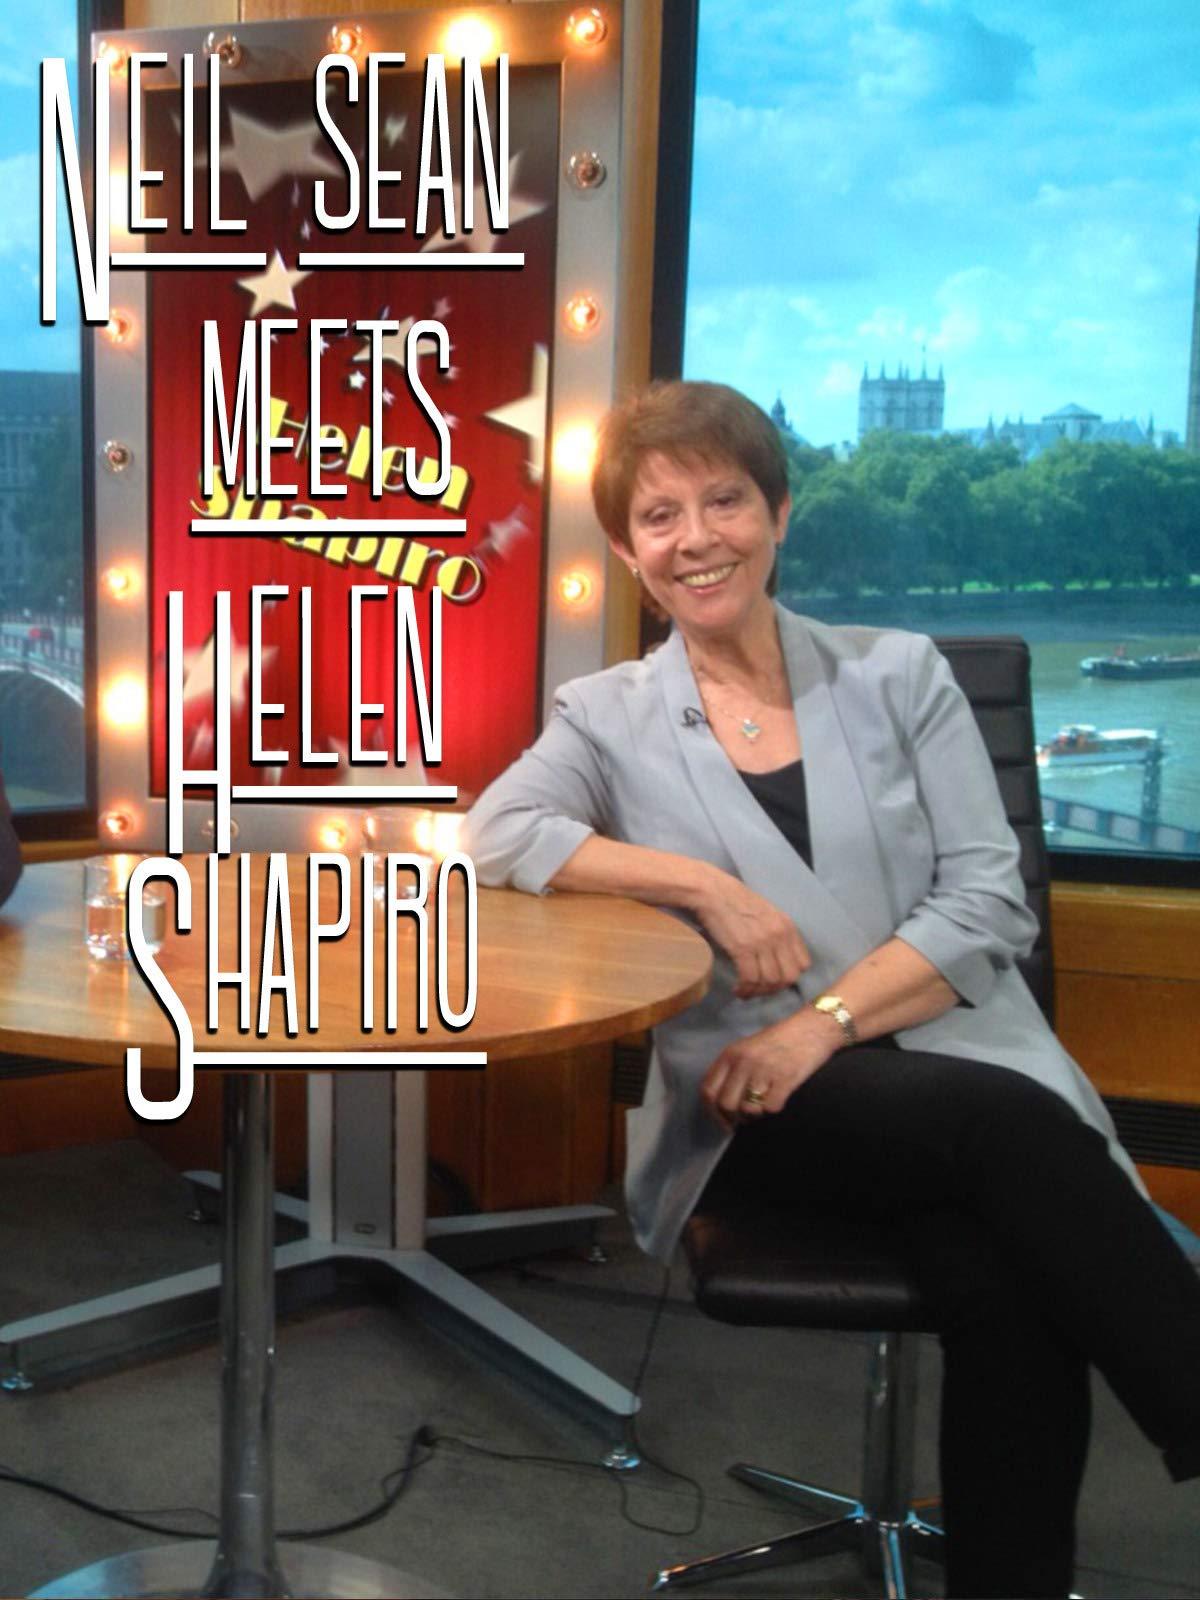 Neil Sean meets Helen Shapiro